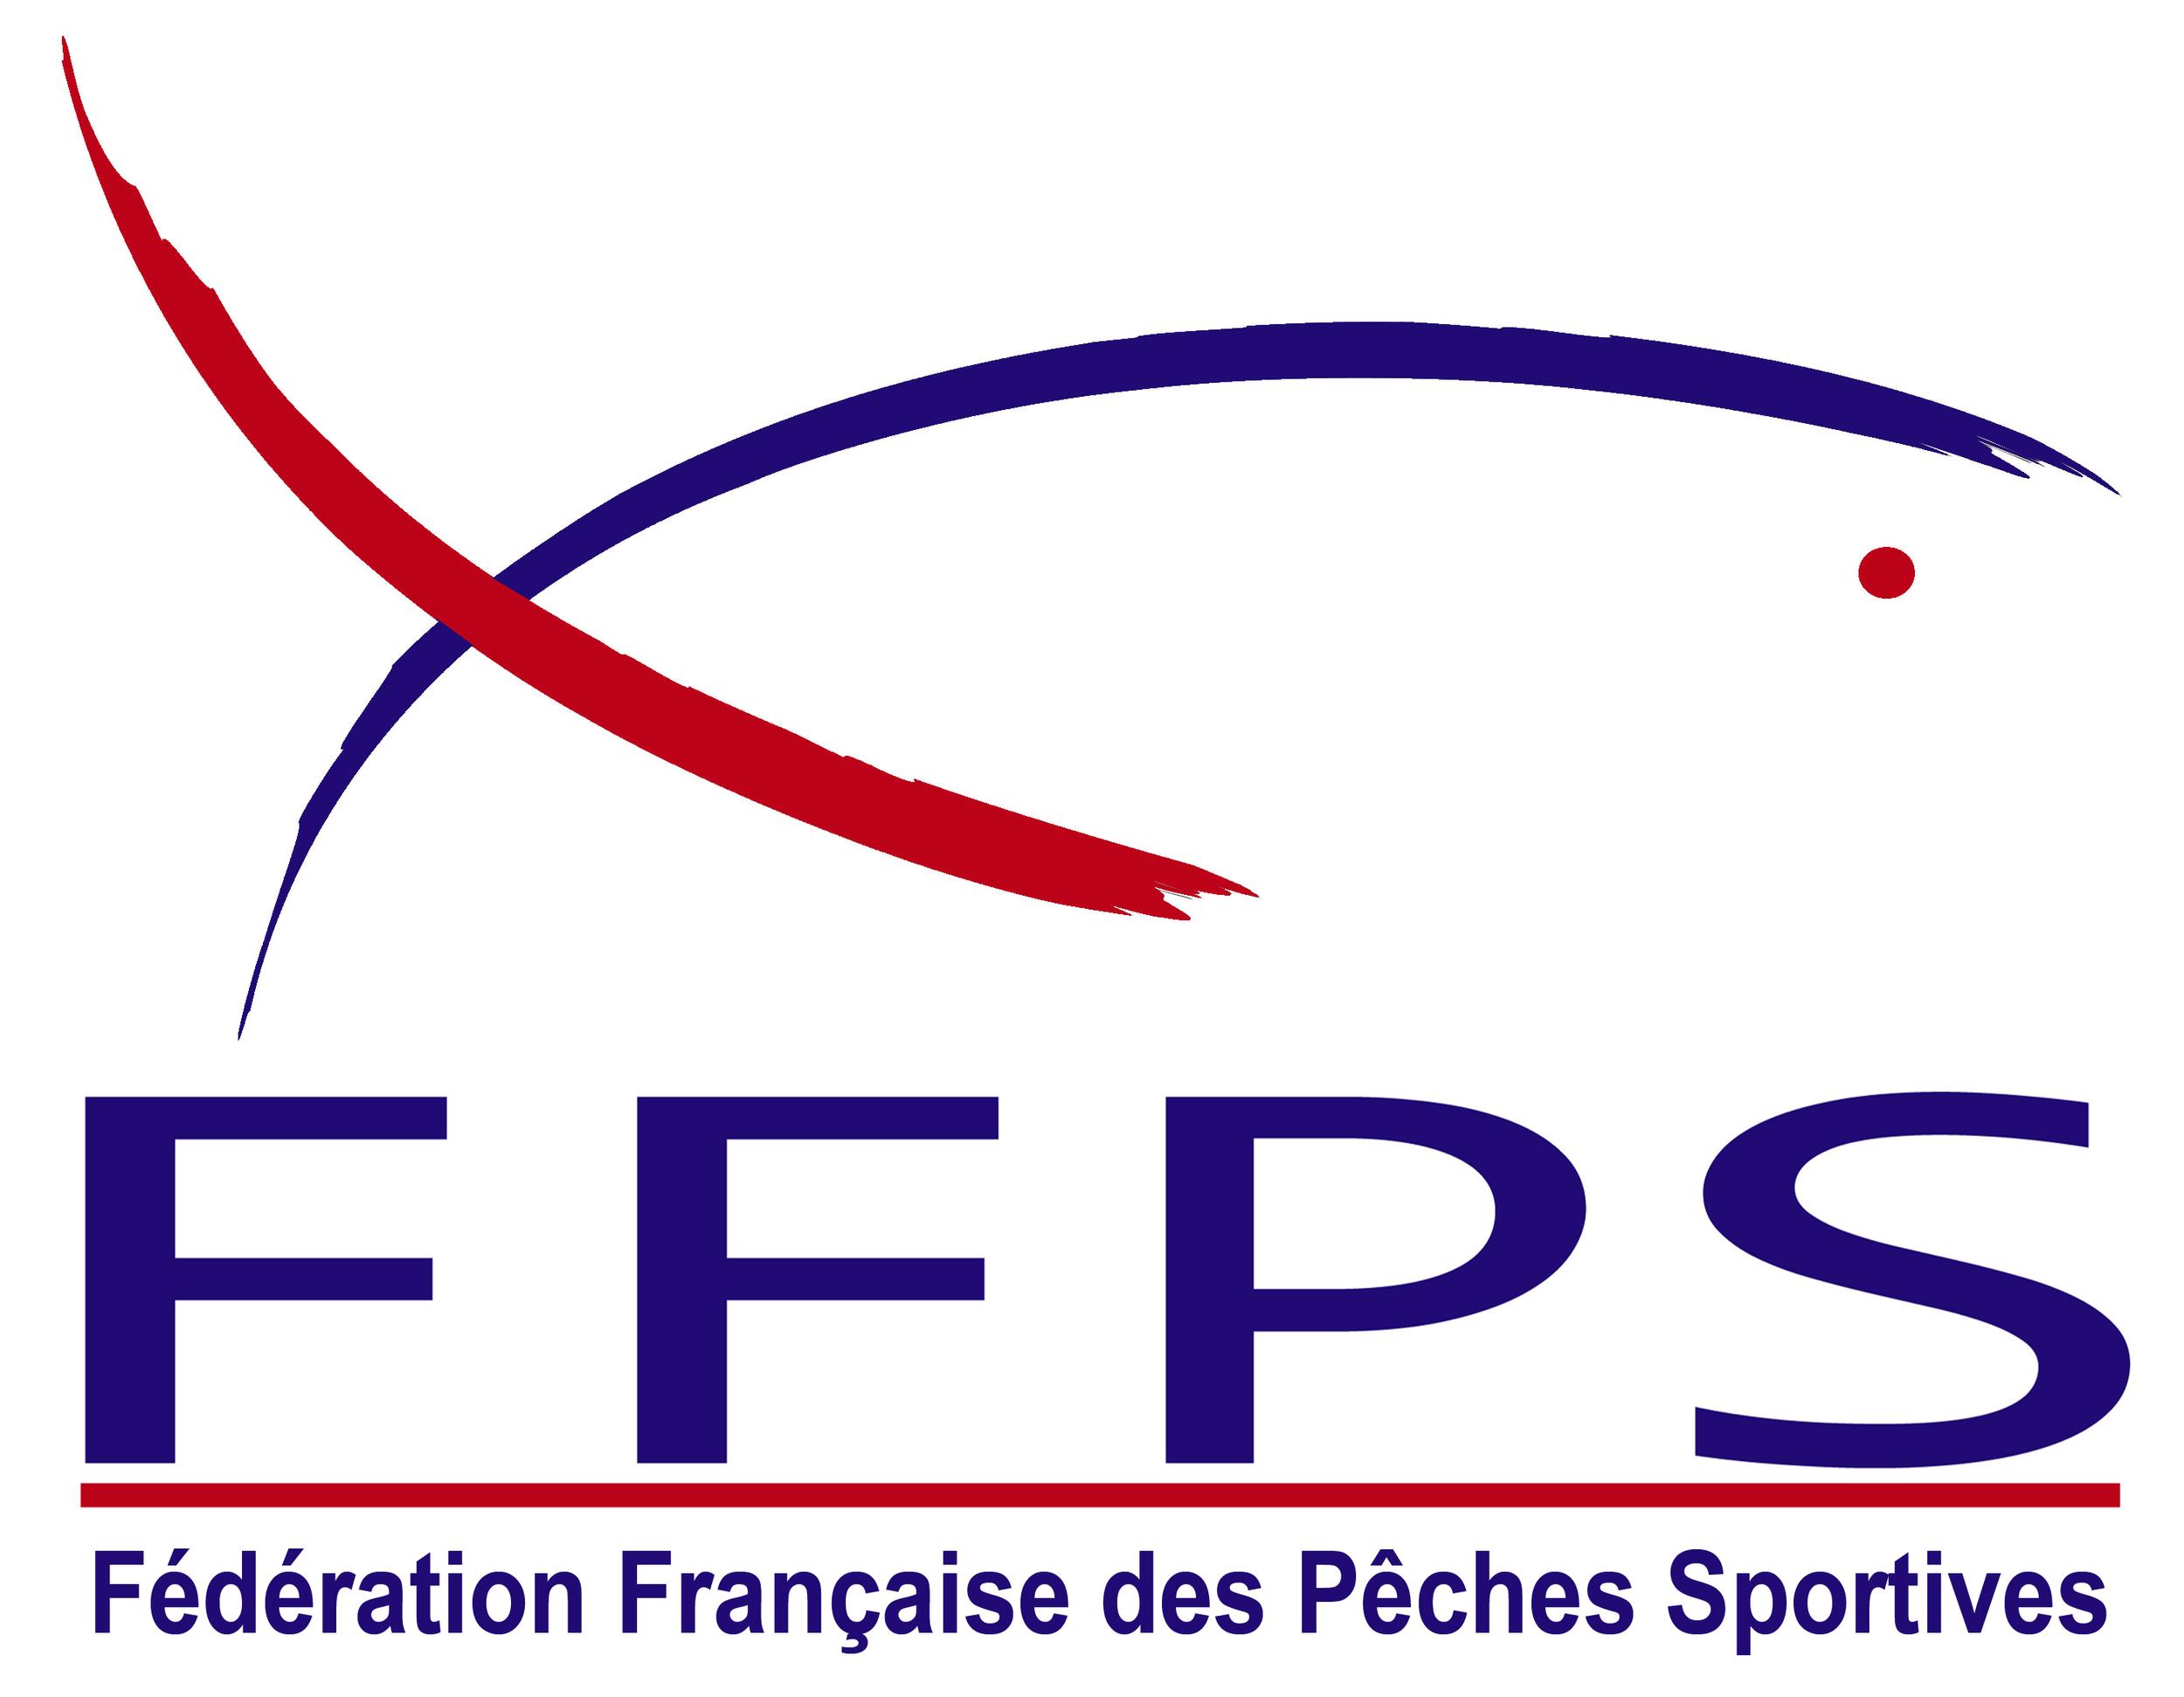 Fédération Française de Pêches Sportives